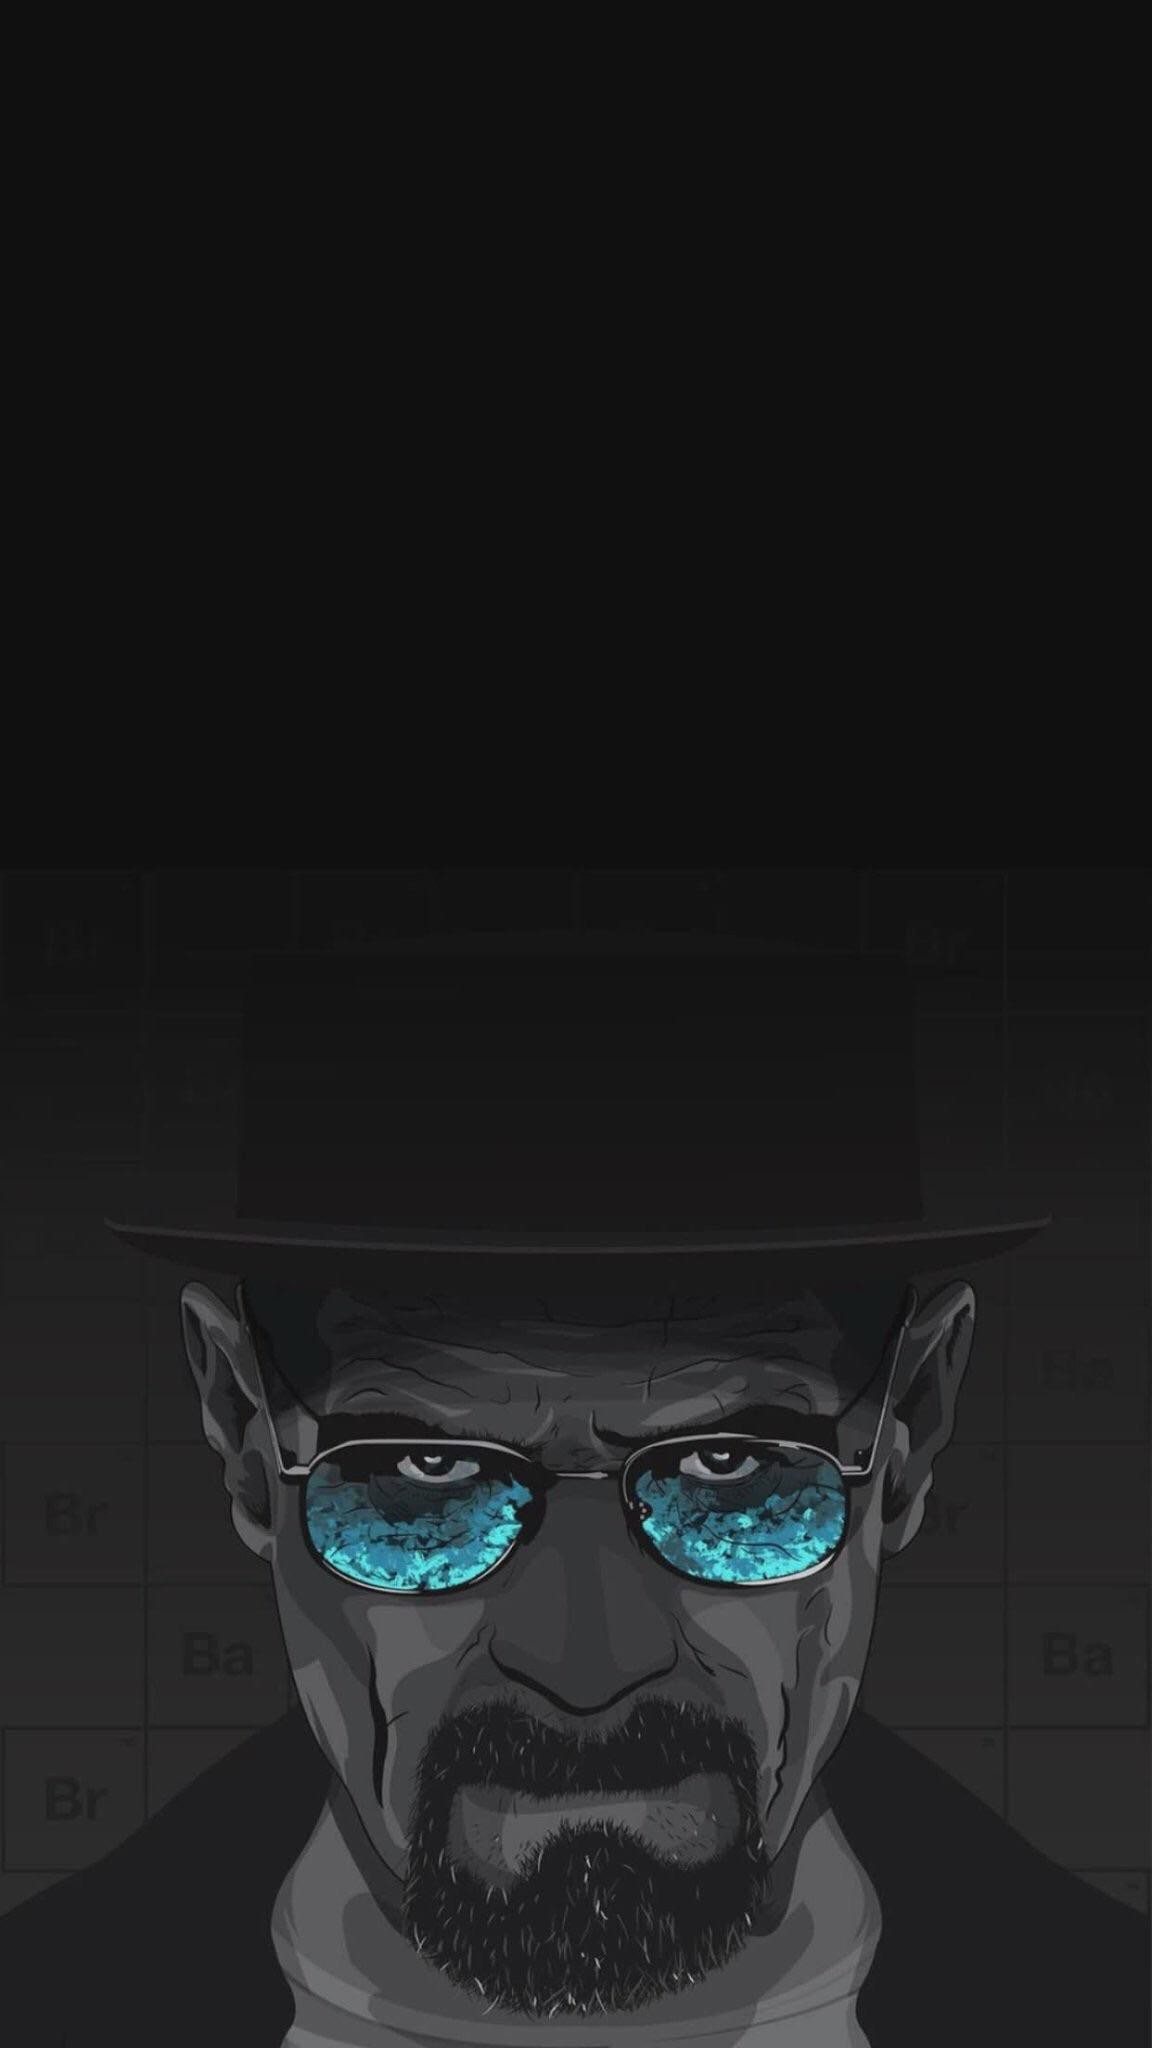 Heisenberg Iphone Wallpaper Heisenberg Wallpaper (...